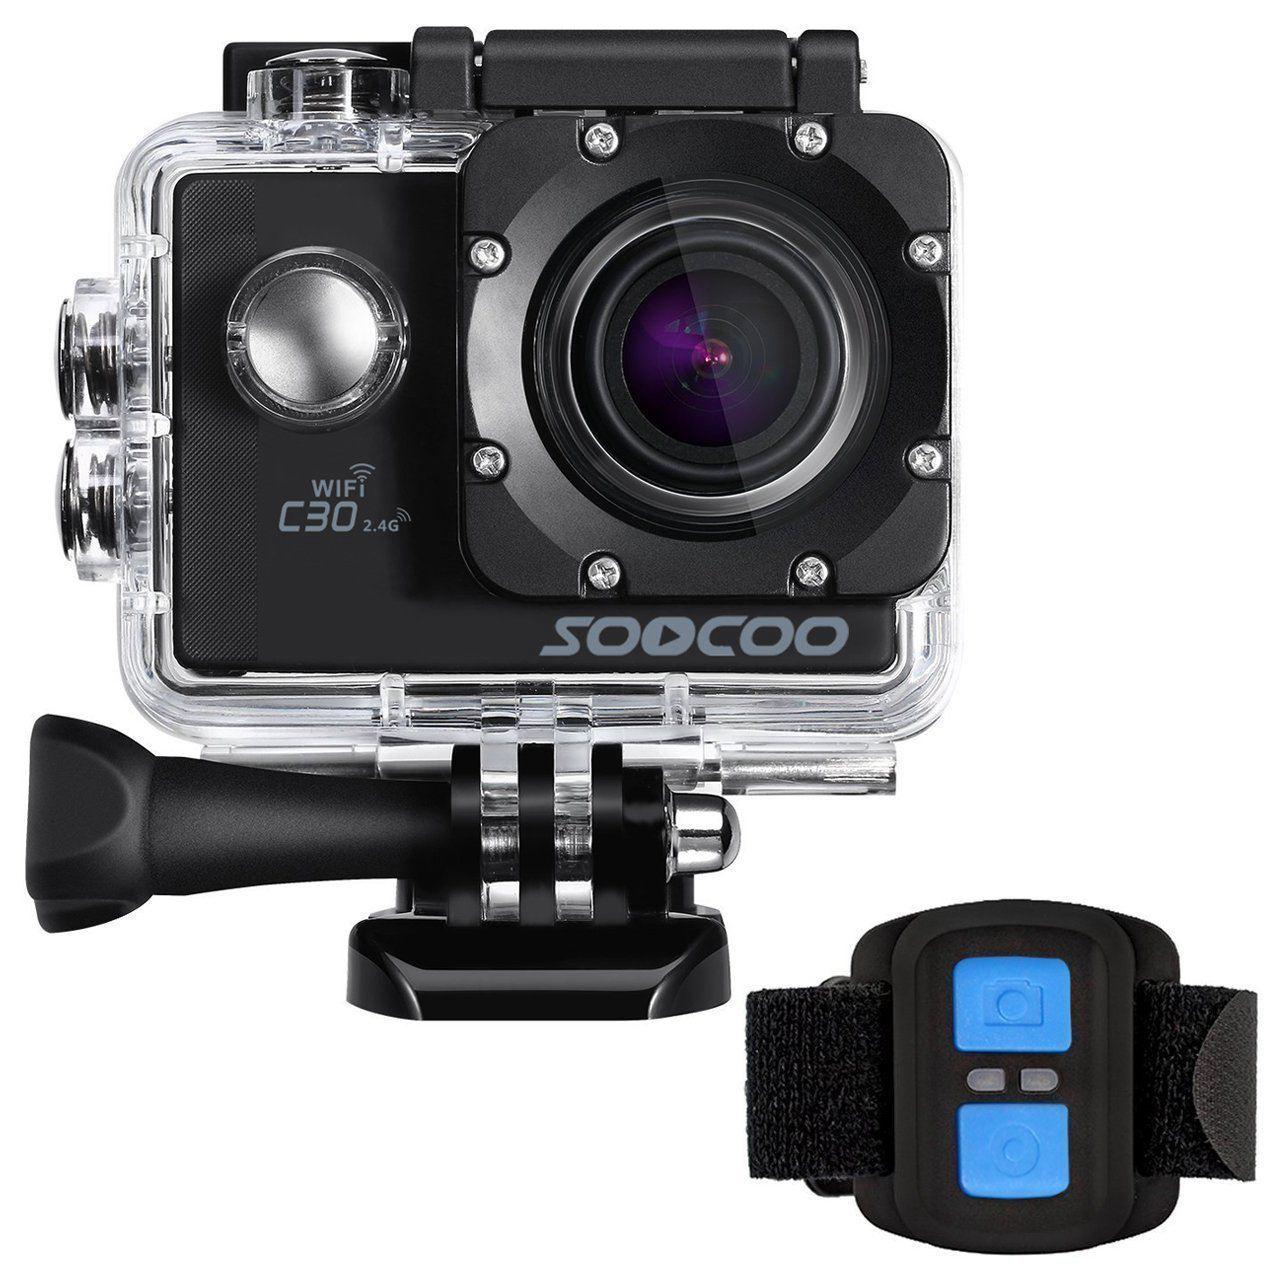 Soocoo C30r Action Kamera 4 K Gyro Wifi Einstellbar Betrachtung Winkel 170 Grad 2,0 Lcd Ntk96660 30 M Wasserdichte Kamera Spezieller Sommer Sale Sport & Action-videokameras Unterhaltungselektronik